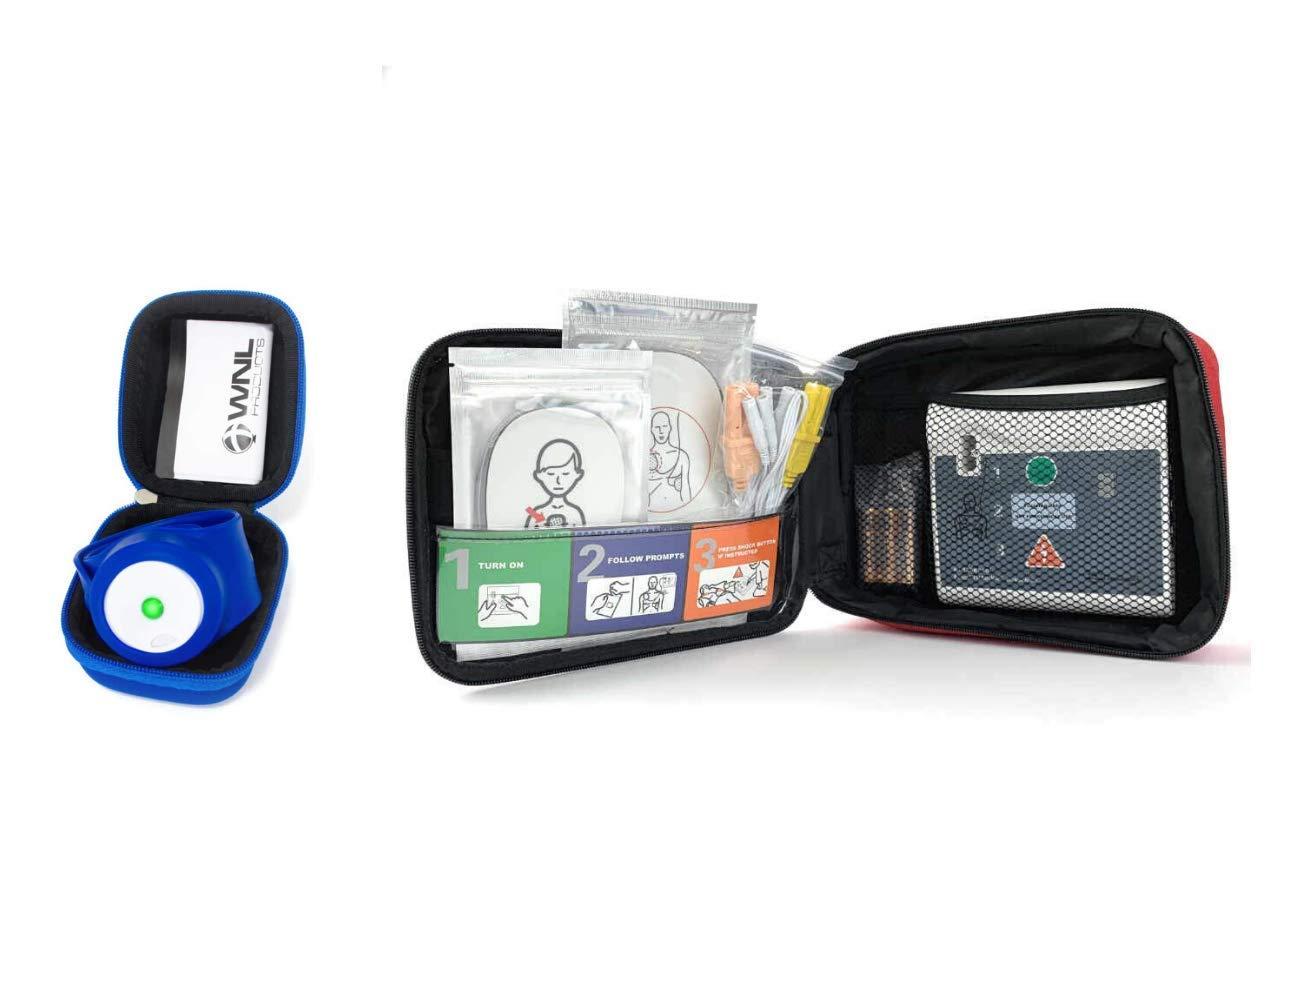 Over item handling ☆ Max 77% OFF WNL Products WL120ES10 WLCRM Defibrillator AED Practi- Bundle: